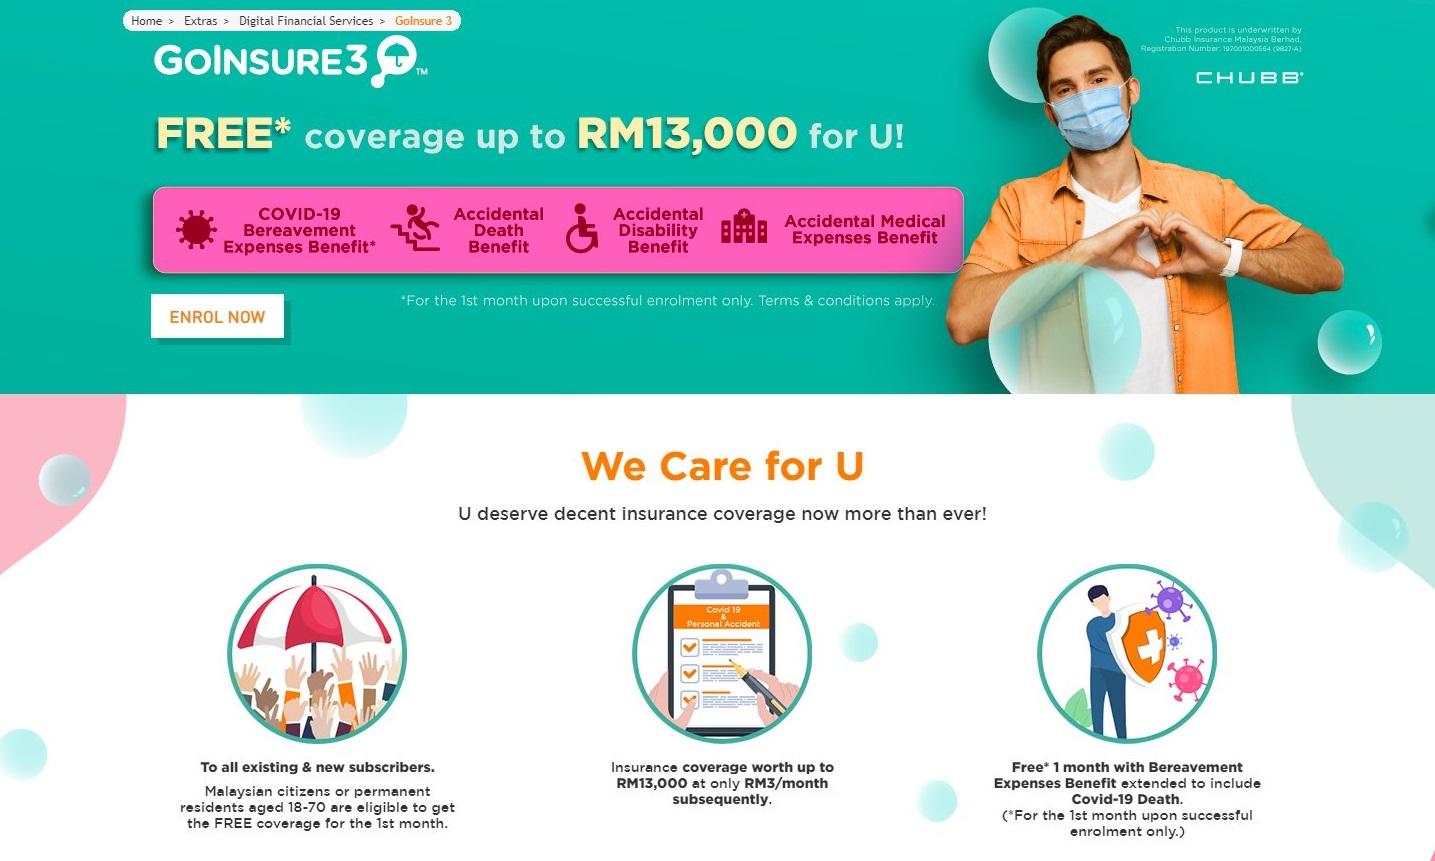 U Mobile's Giler BagiLebih Campaign Offers Free Personal Accident Insurance